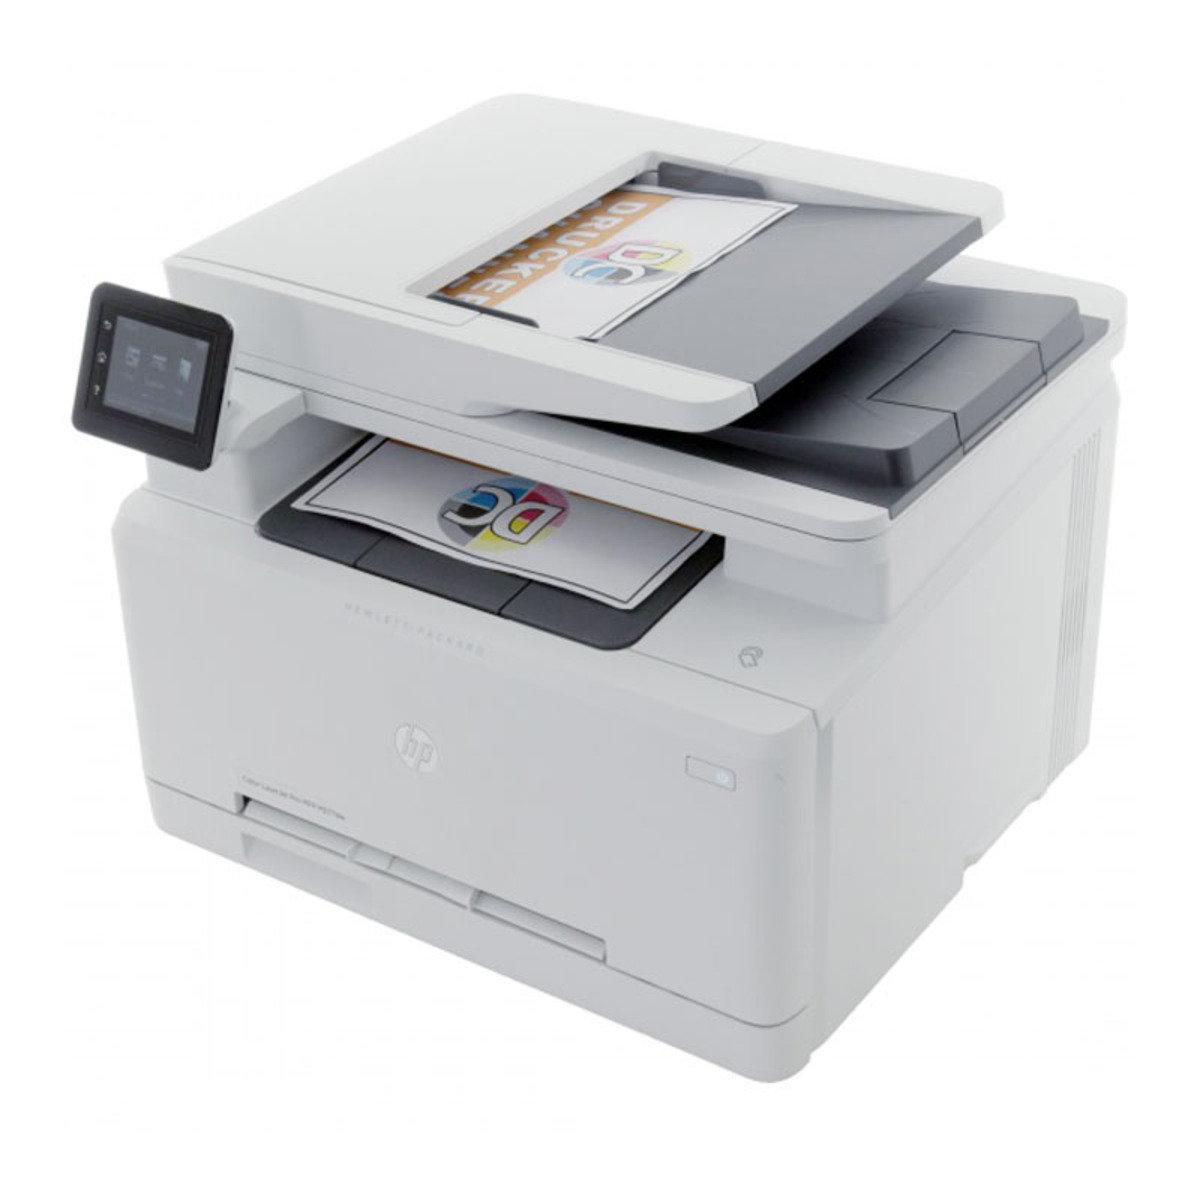 HP Color LaserJet Pro 辦公室鐳射多功能打印機 Color LaserJet Pro MFP M277N